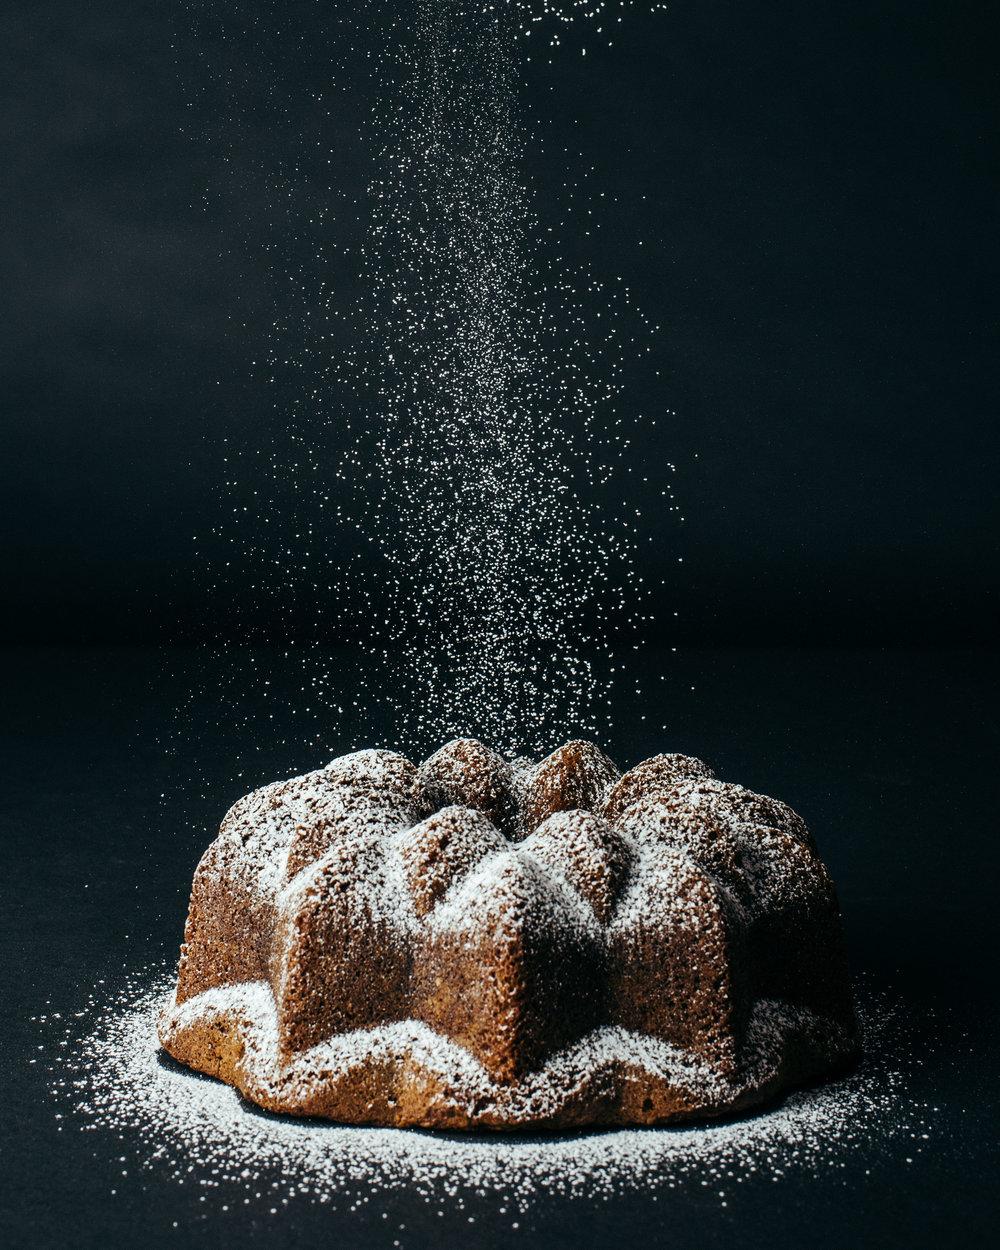 cake-005 copy.jpg